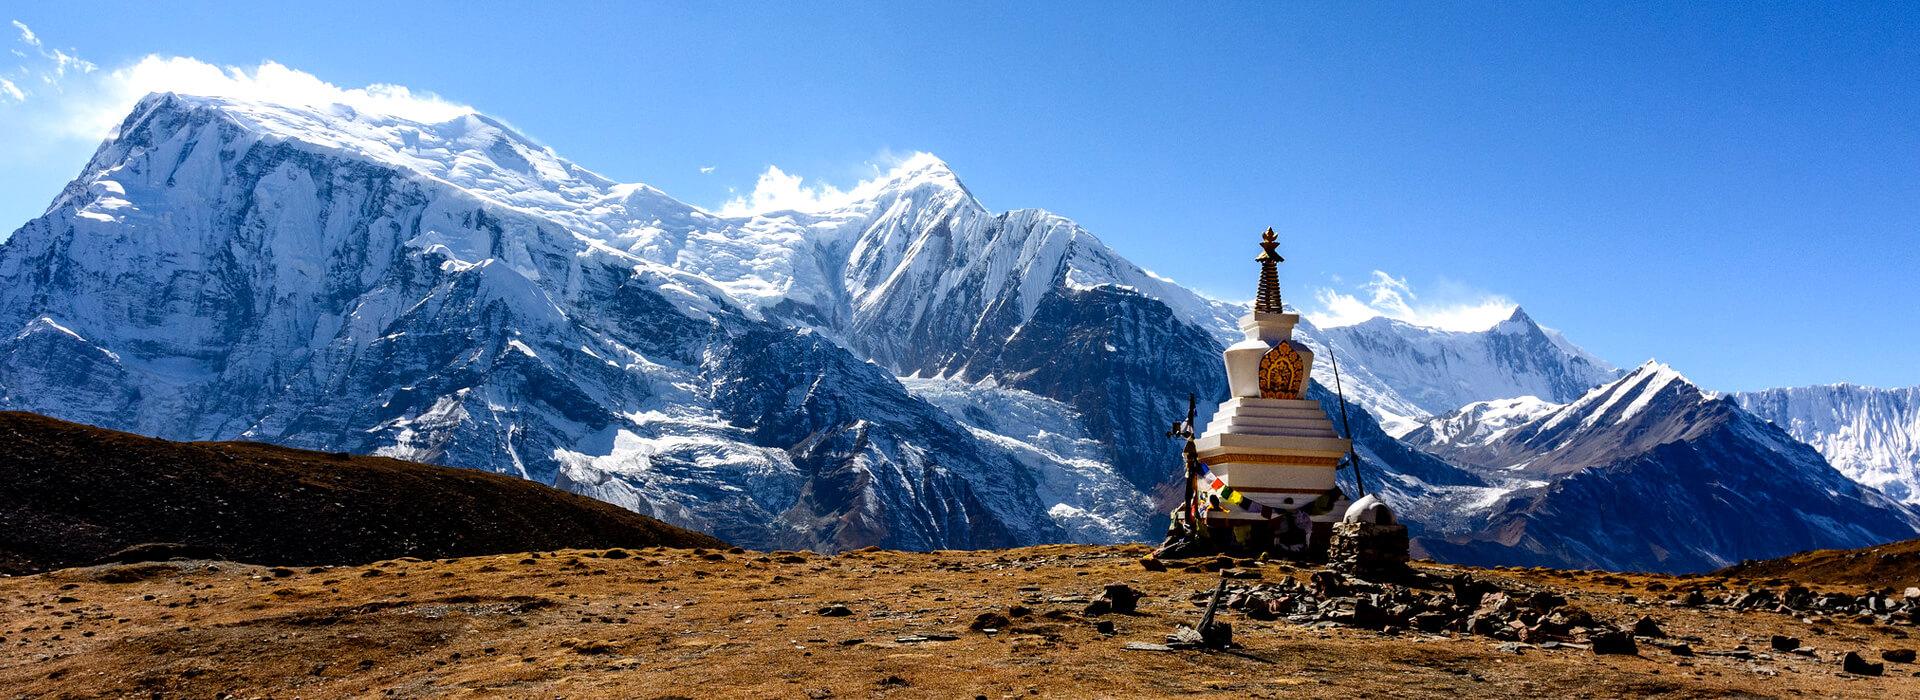 Annapurna Circuti Trek